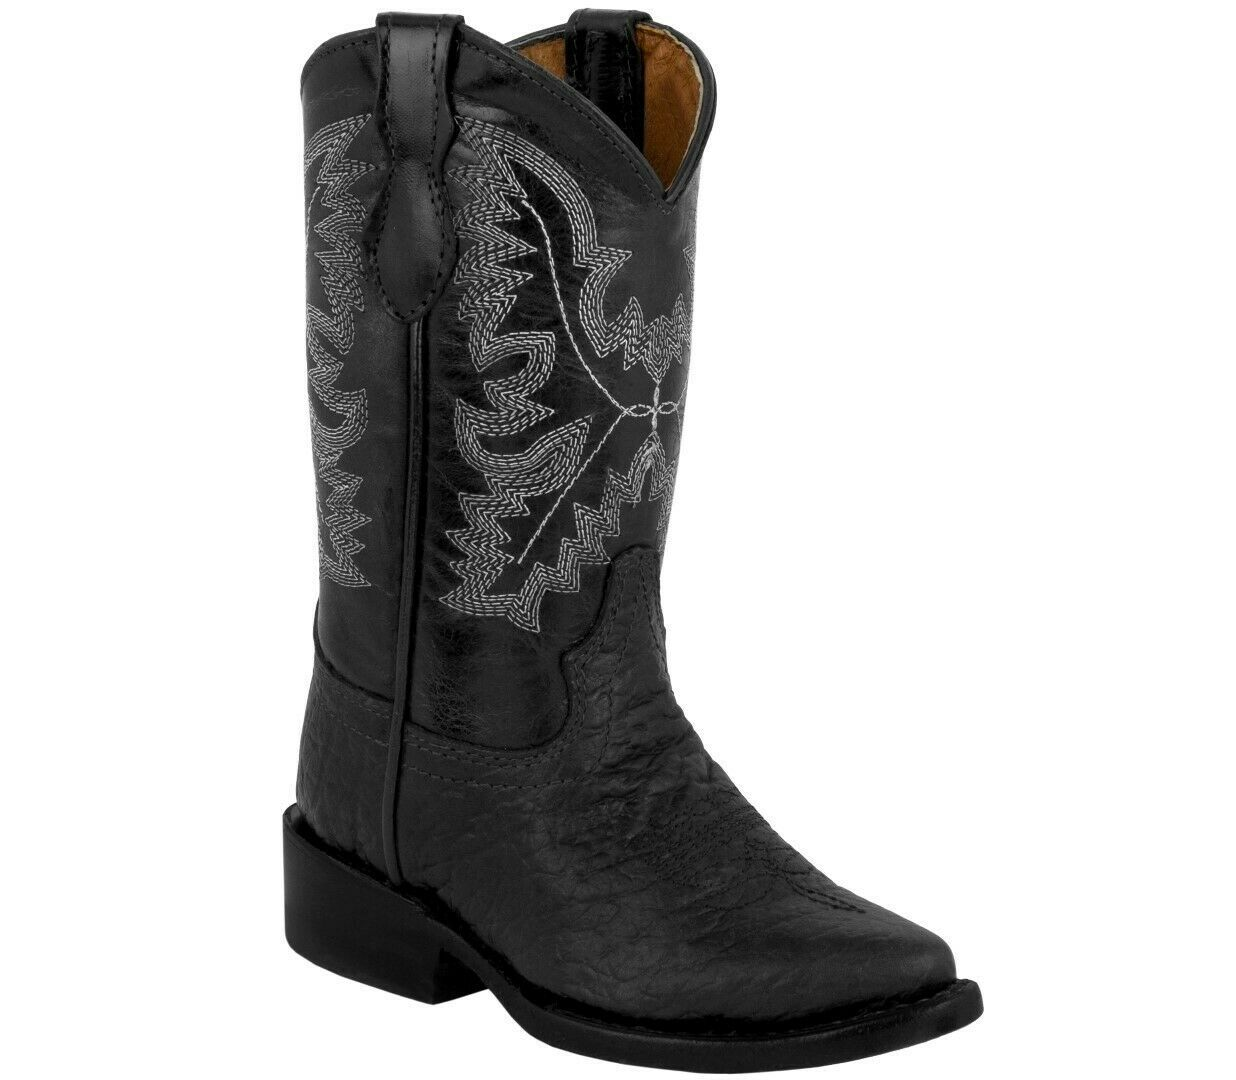 Kids Toddler Cowboy Boots Bull Buffalo Print And 50